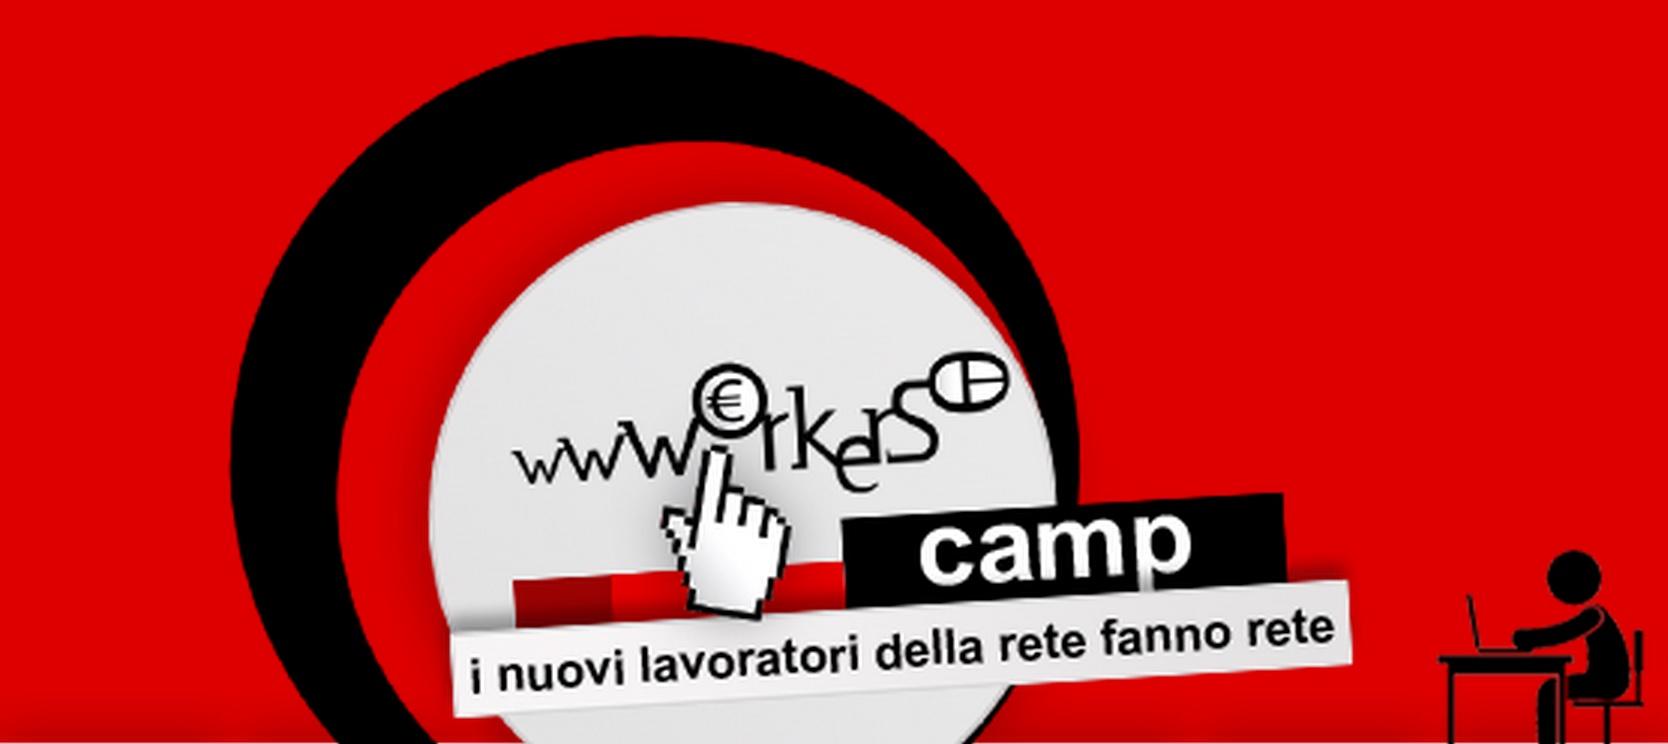 Wwworkers_Camp_2015_-_Roma__Camera_dei_Deputati